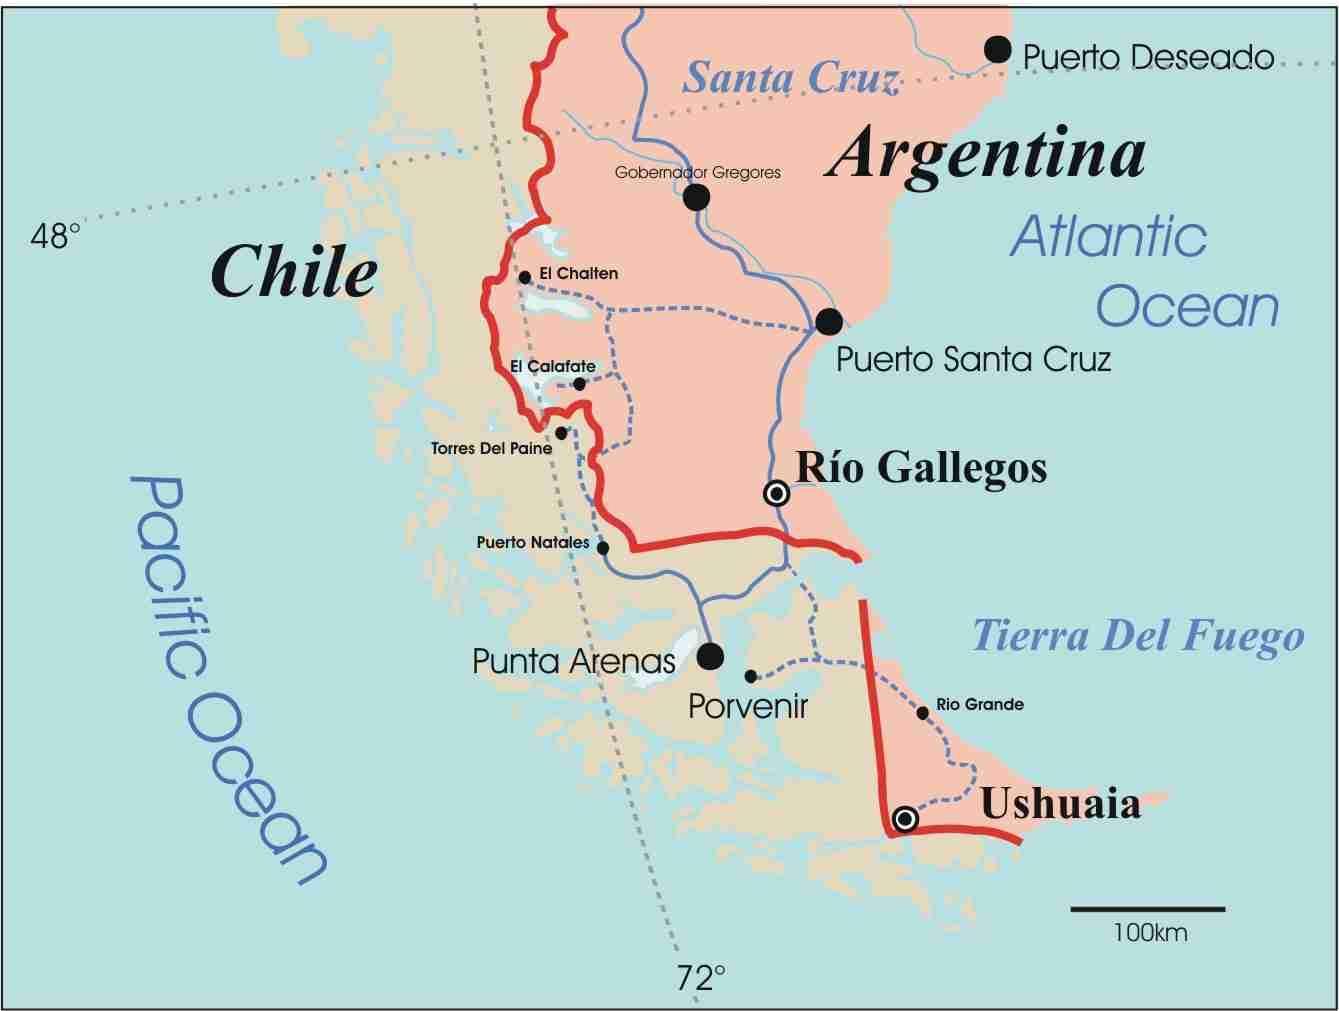 chile kart Patagonia i Chile kart   Kart over patagonia i Chile (Sør Amerika  chile kart